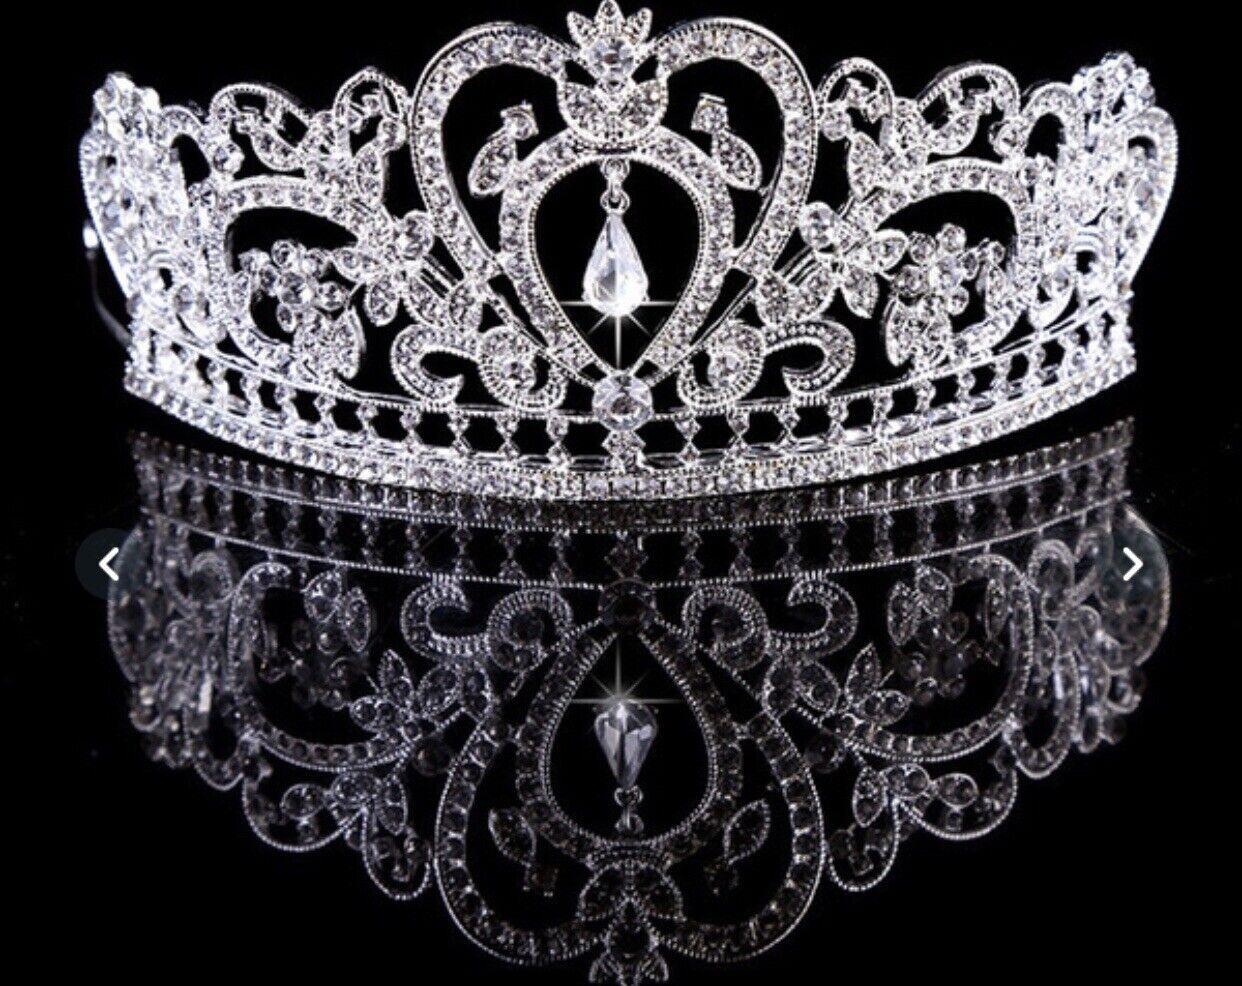 🇮🇪pretty Wedding Communion Tiara 61/2 Cm Silver Shipped From Ireland